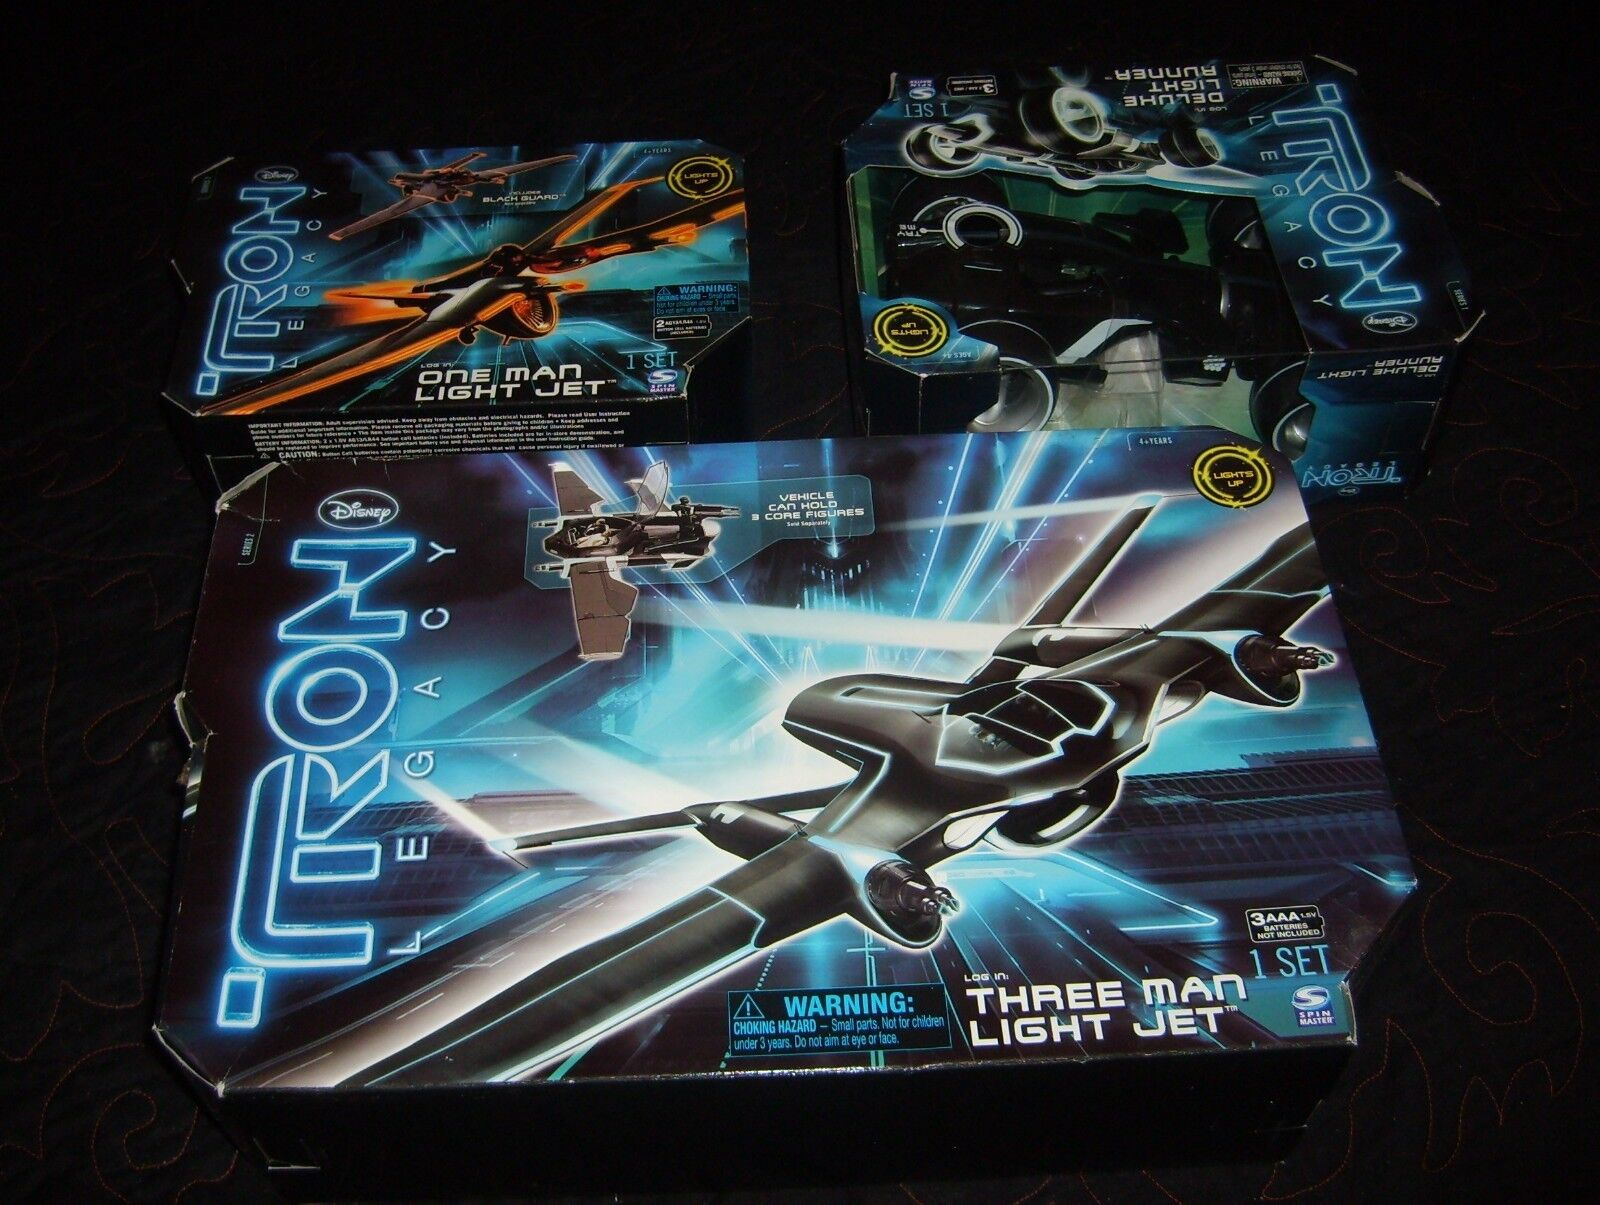 Tron Legacy (3)Vehicals  Three